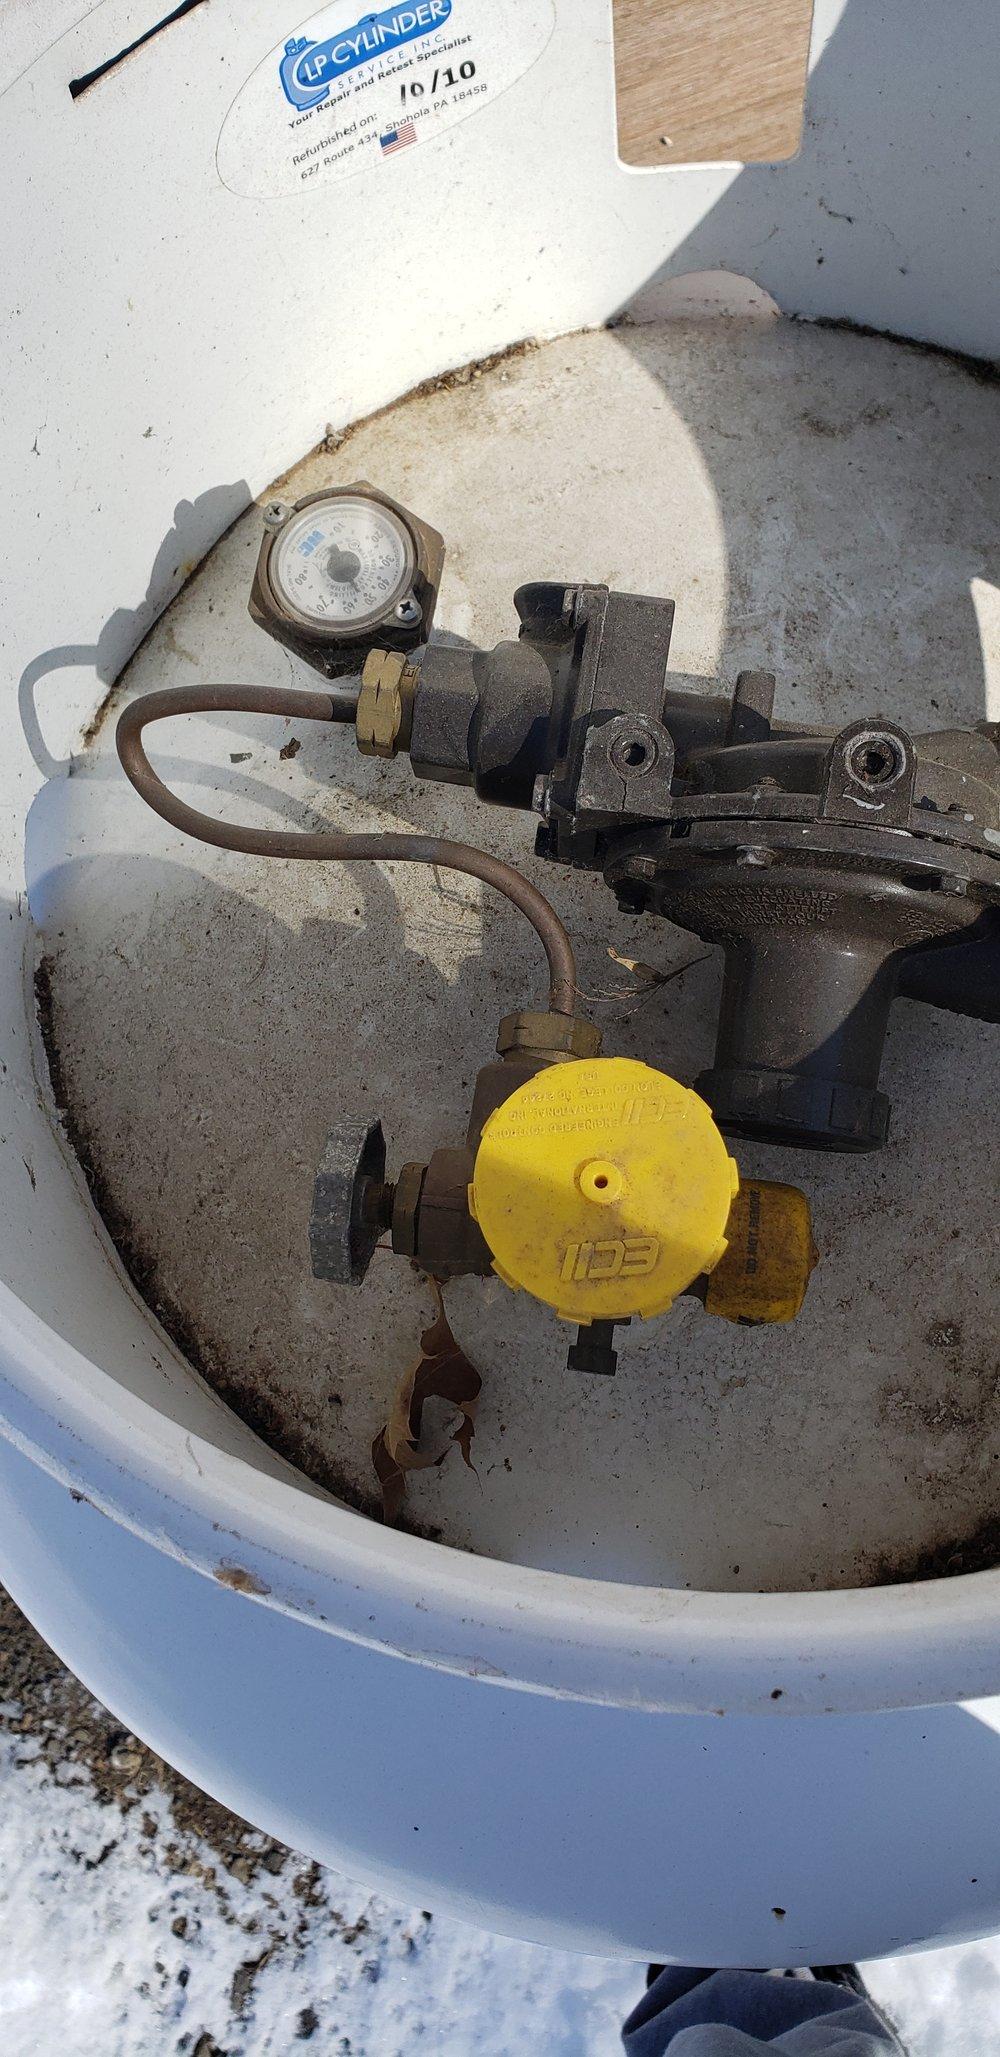 Propane Shutoff (top of tank)